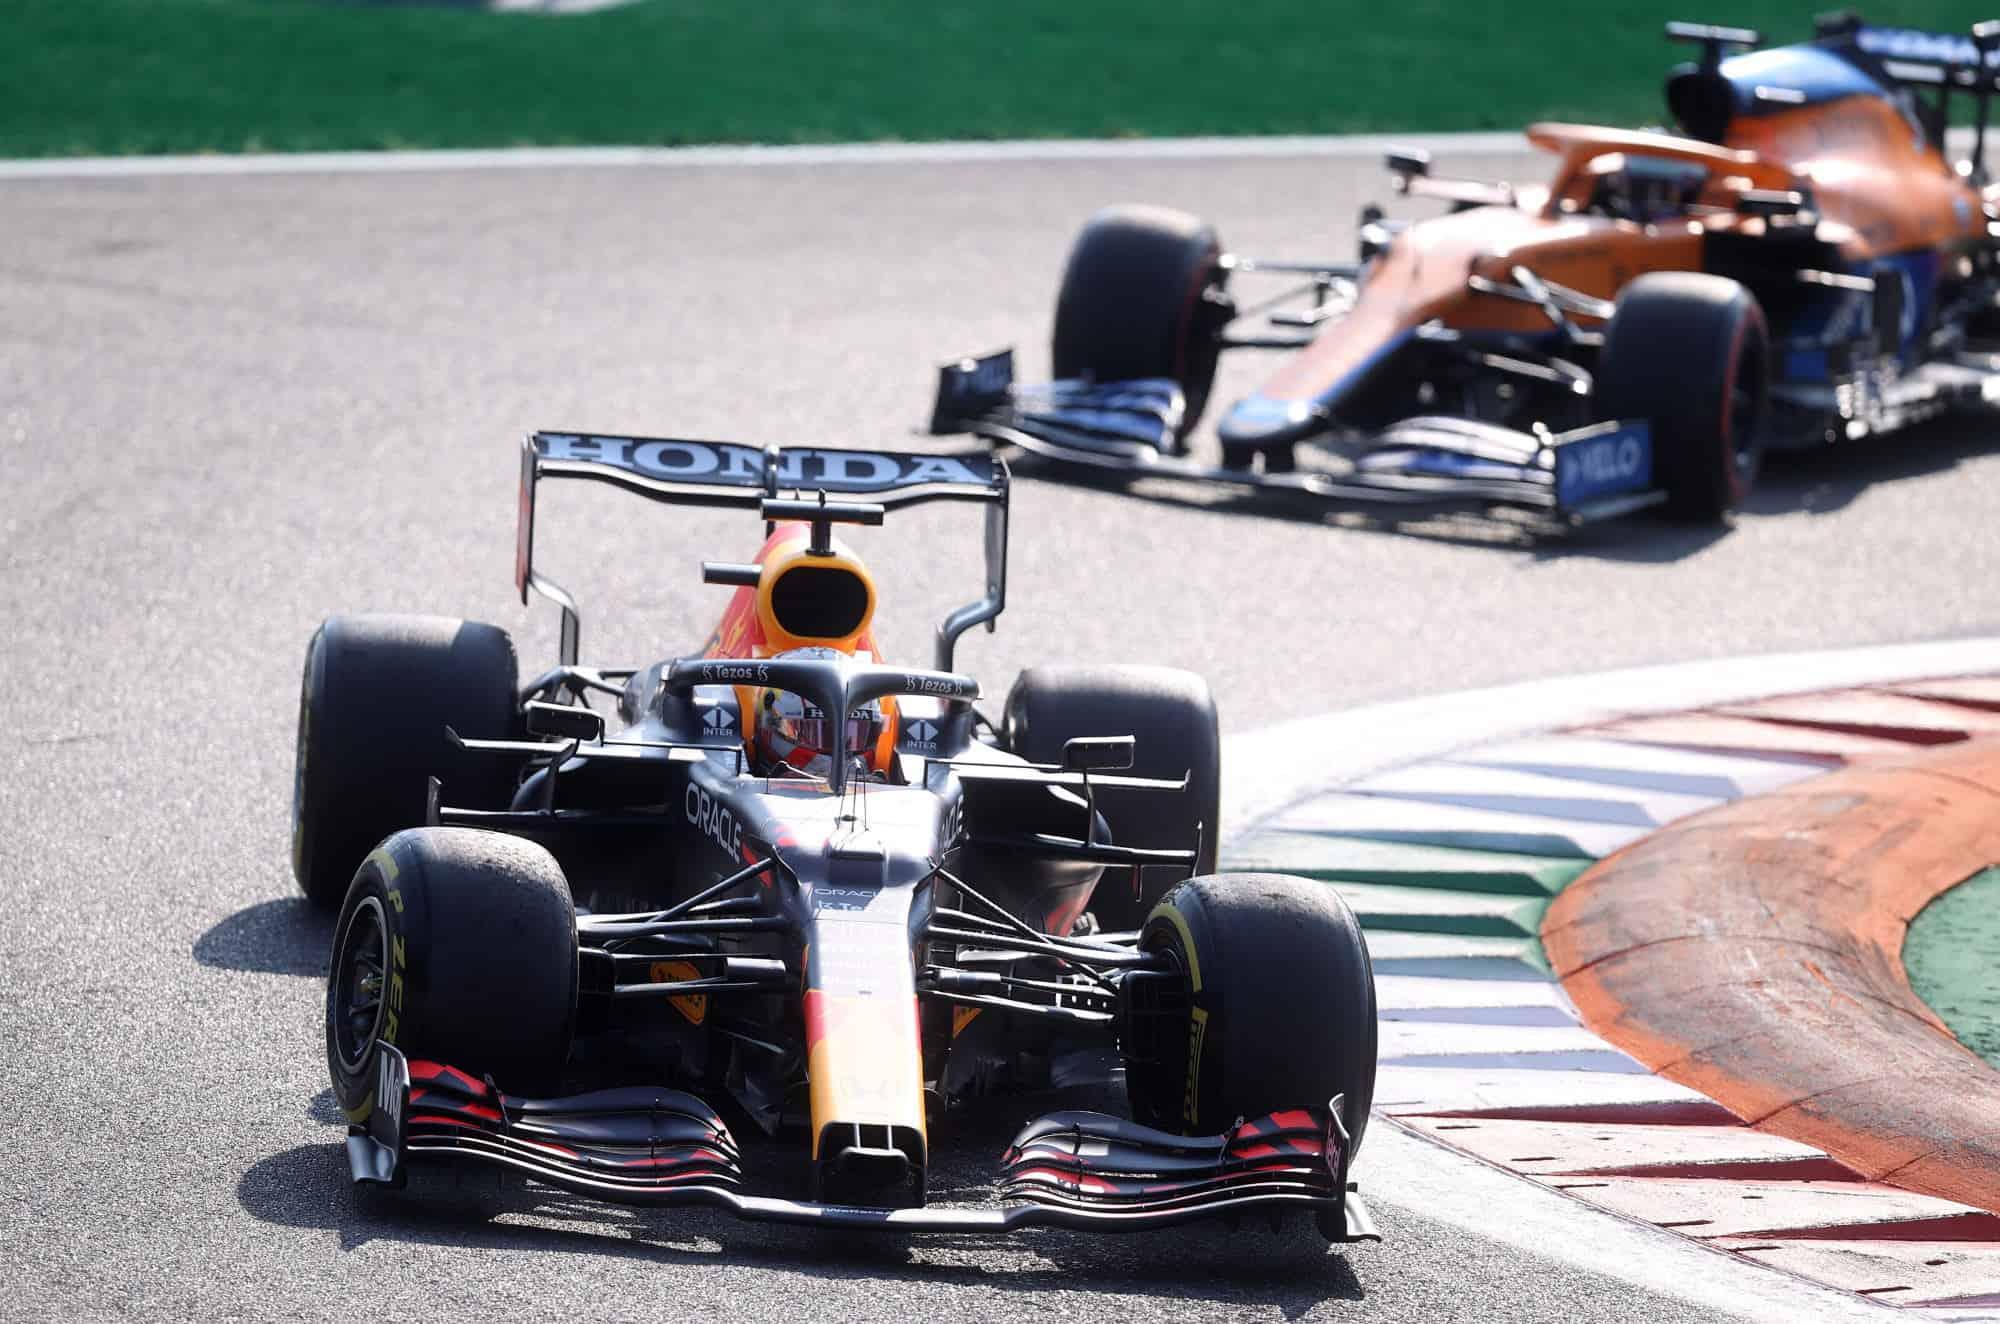 2021 Italian GP Verstappen leads Ricciardo Photo Red Bull